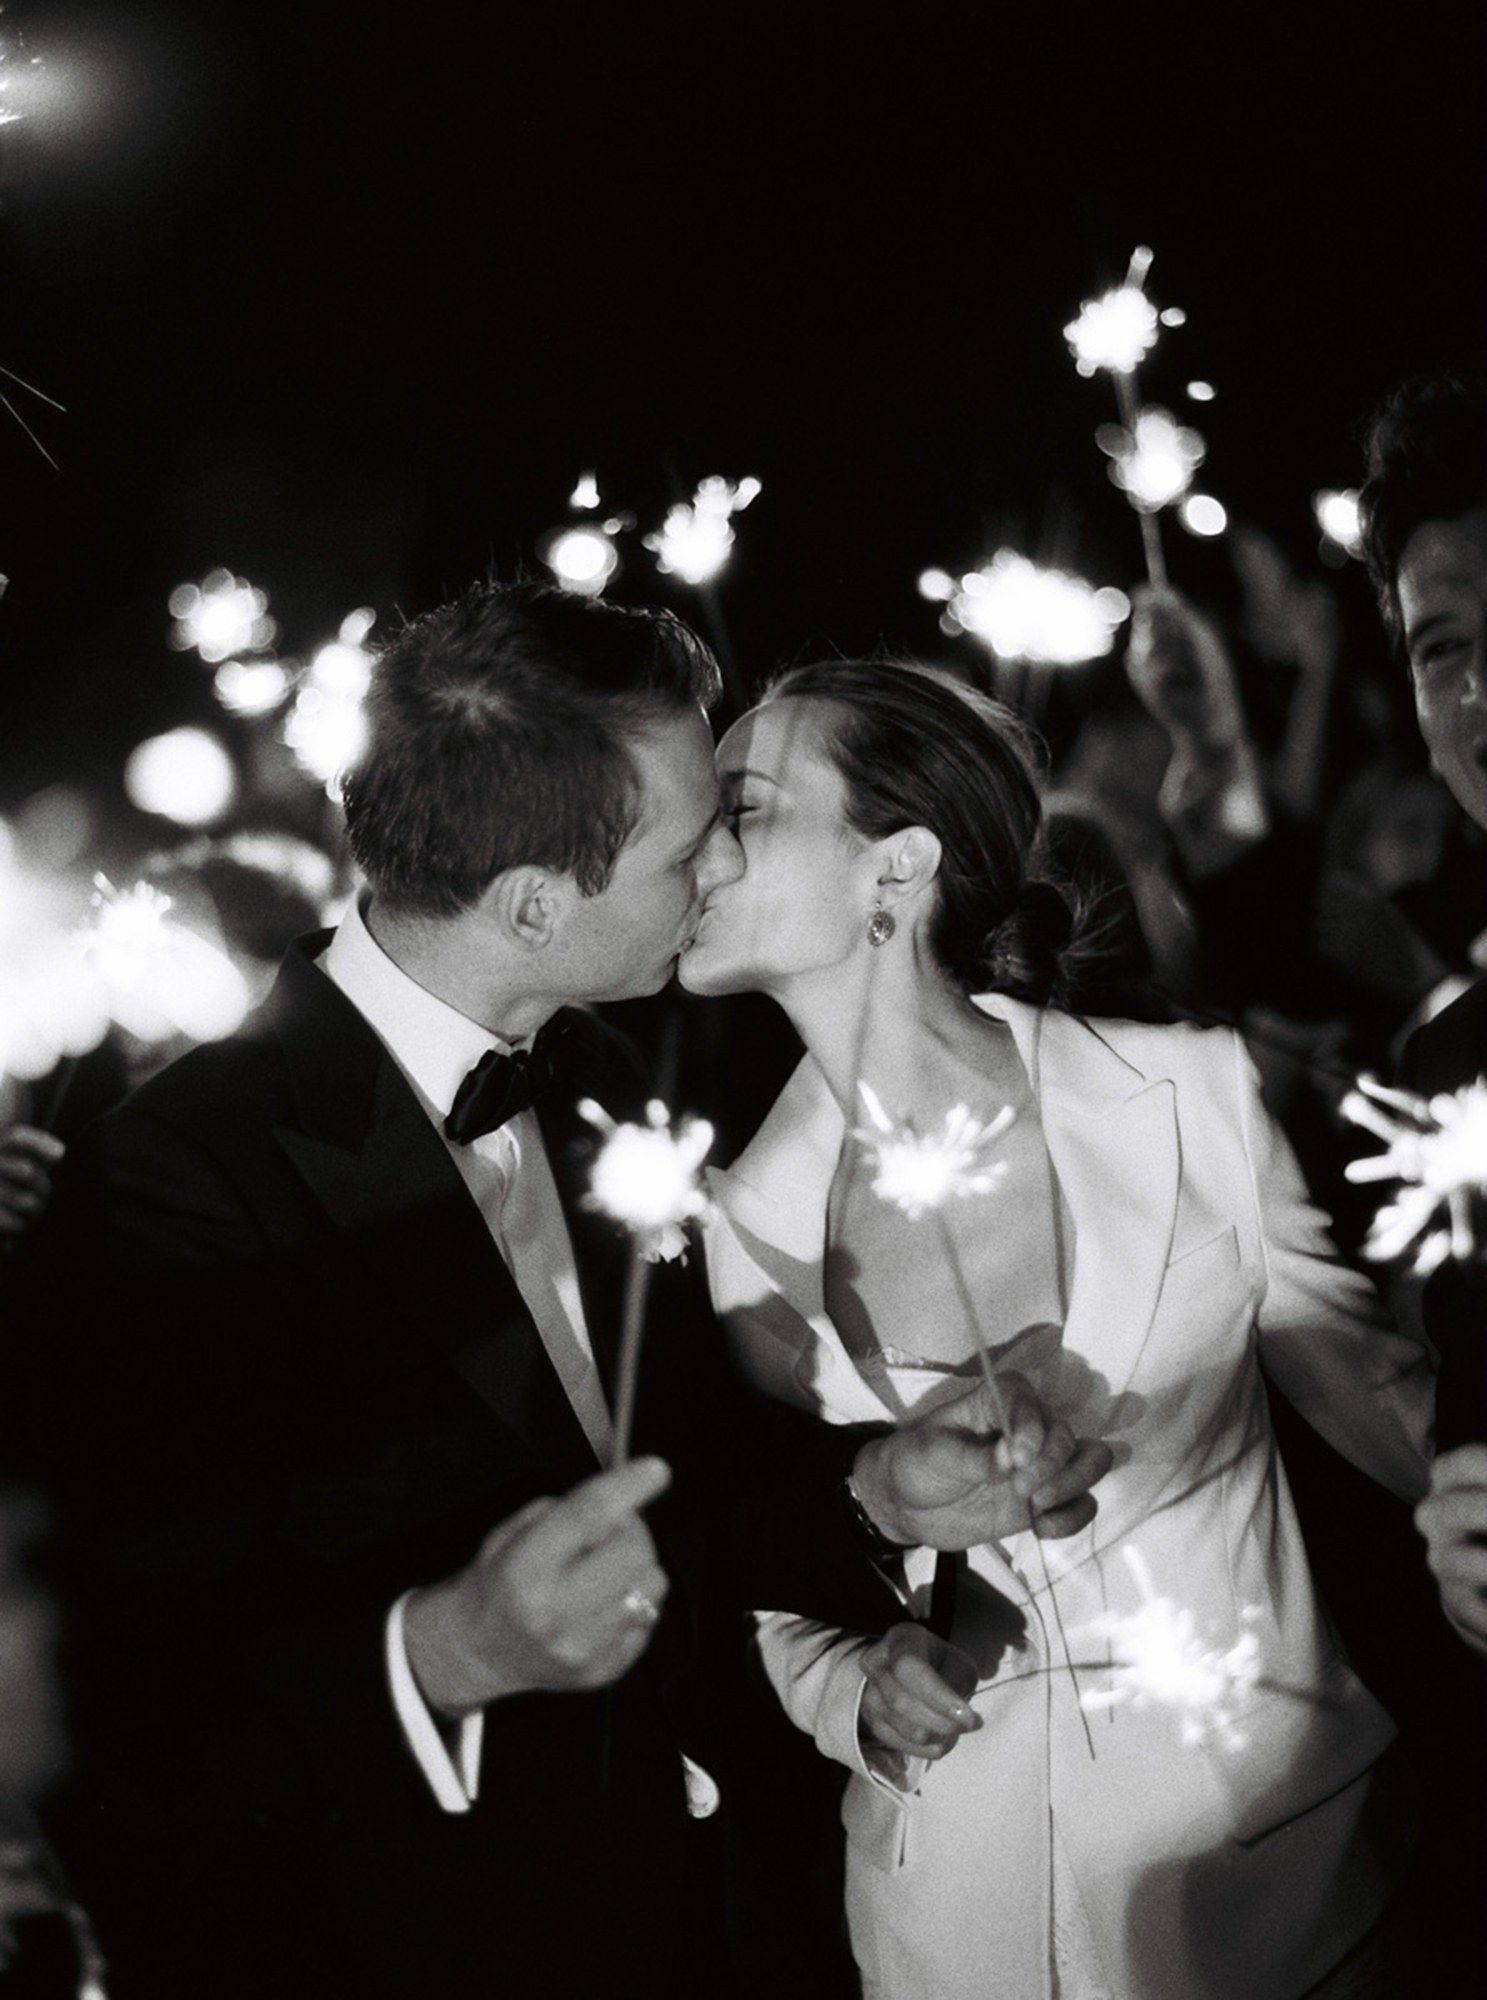 Whitney Toombs and Thomas Voûte's wedding